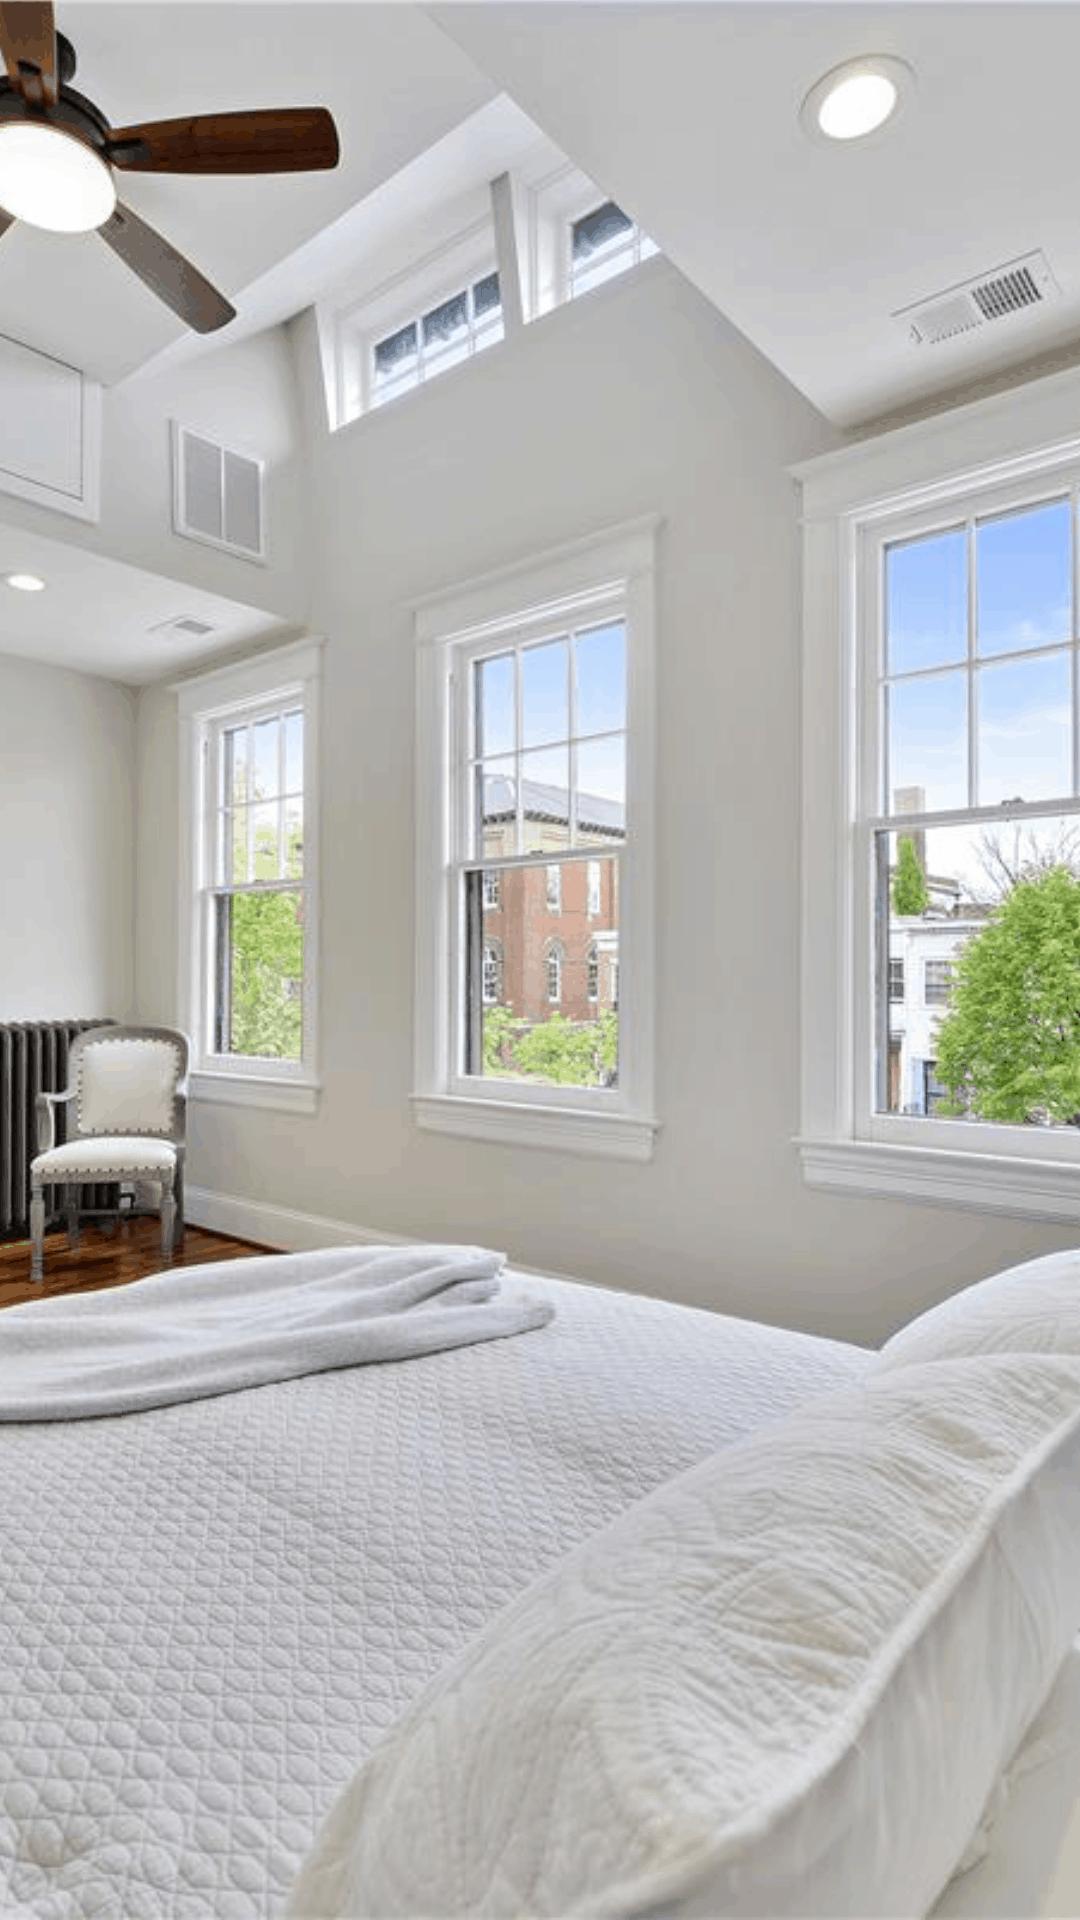 A_SE_mansard_windows_light_Upper Level-Bedroom_1080 x 1920